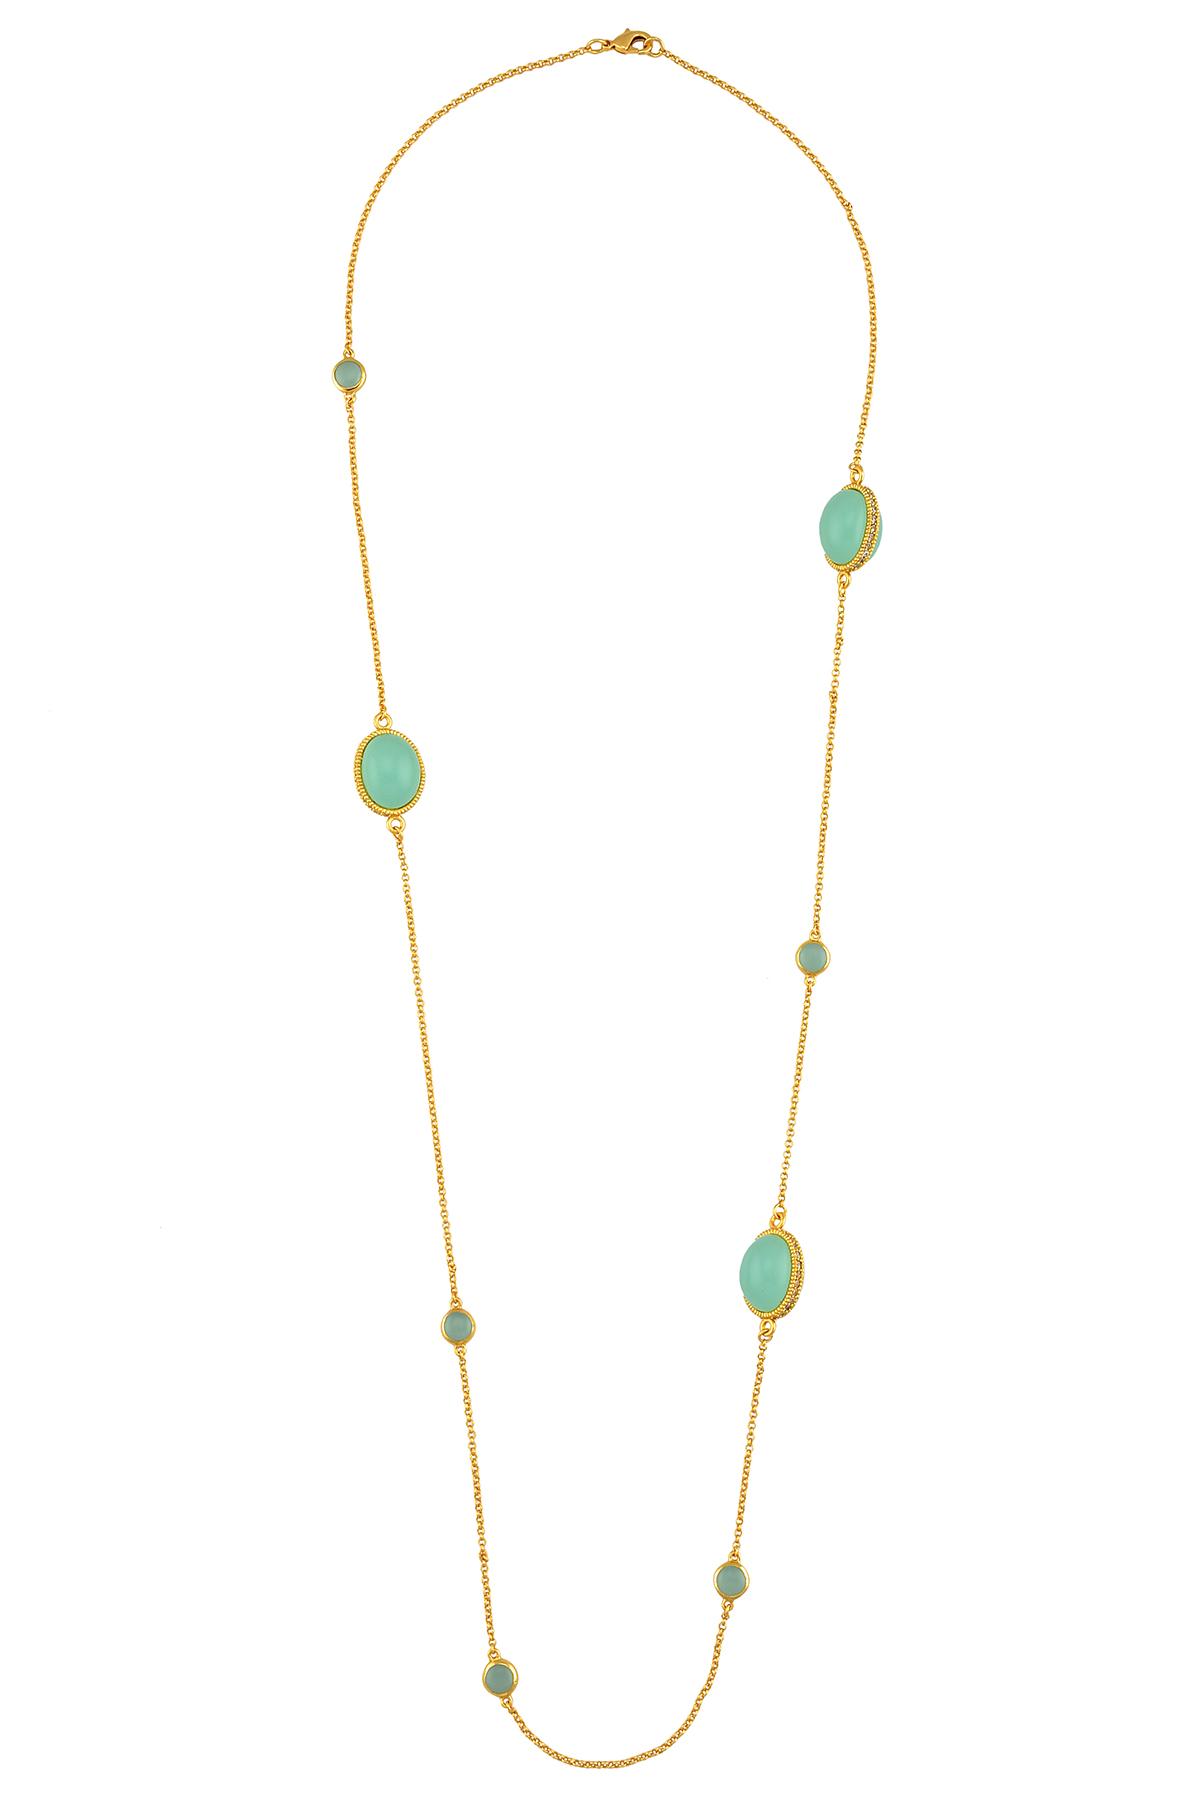 Aqua Oval Round Glass Single Strand Necklace